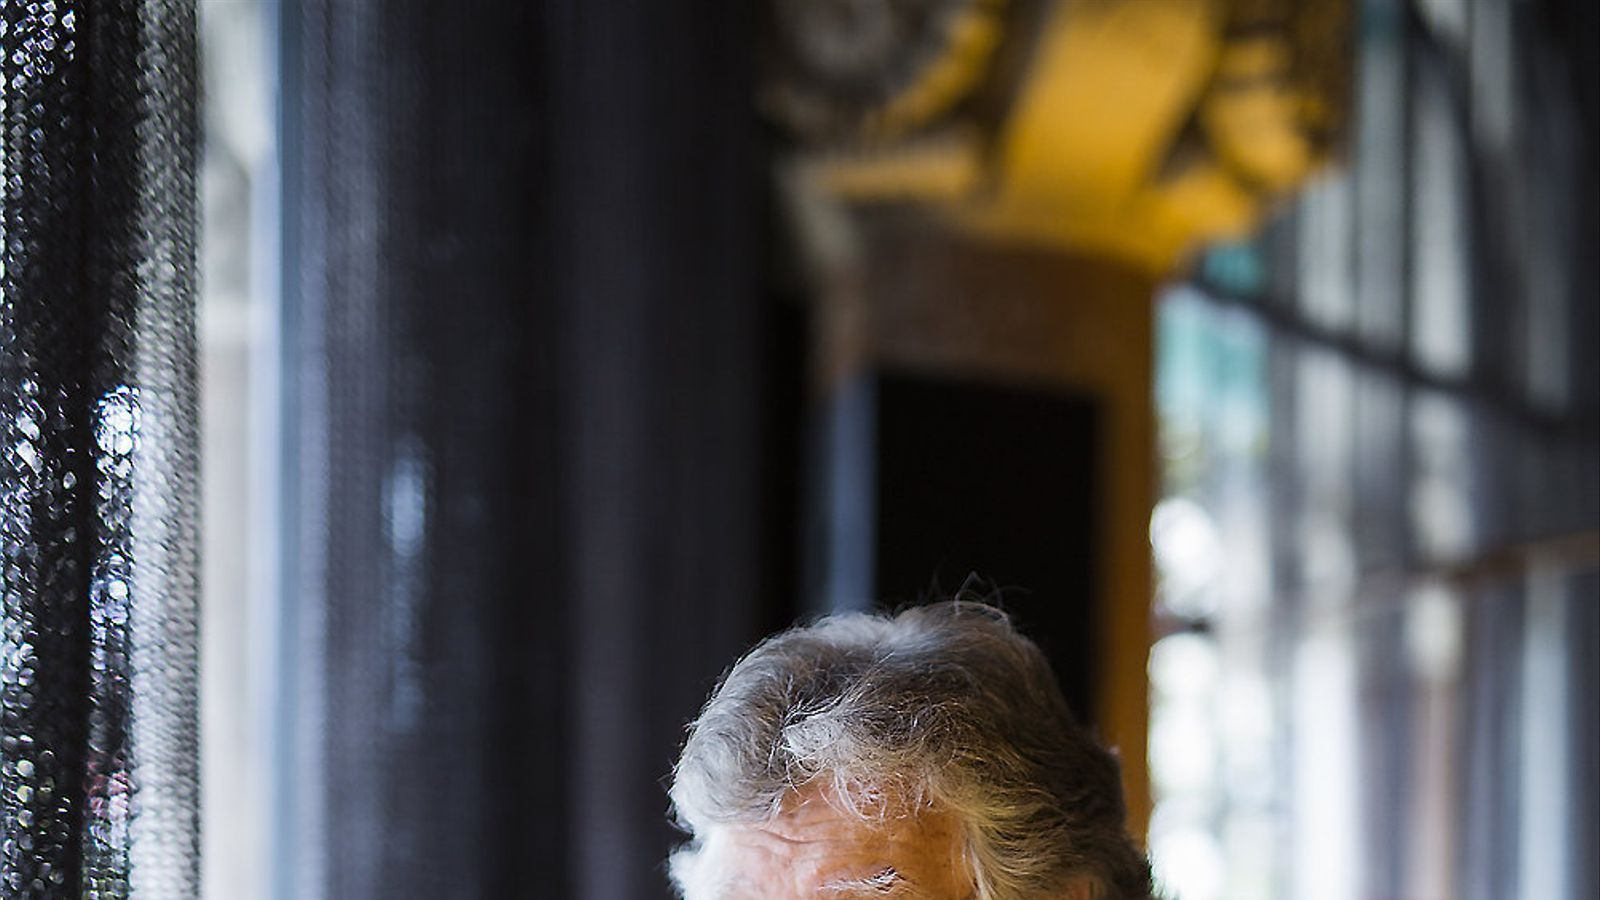 Joaquín Estefanía ha estat a Barcelona per presentar el seu últim llibre: Abuelo, ¿cómo habéis consentido esto? / FRANCESC MELCION